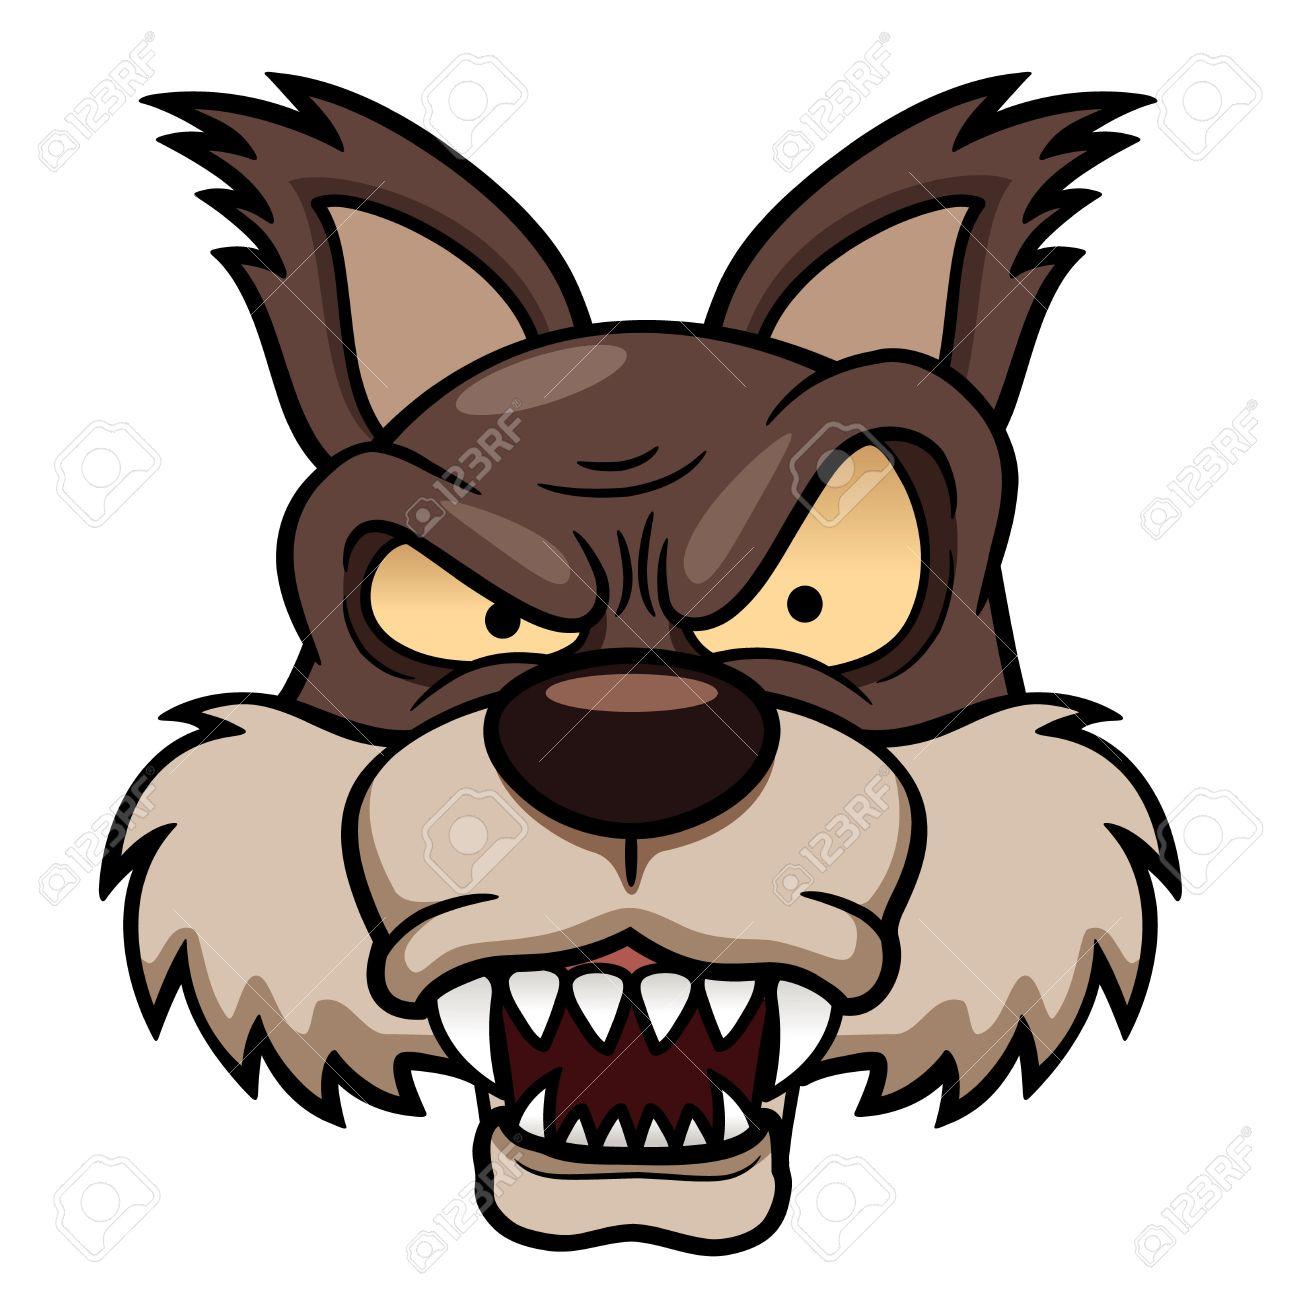 1300x1300 Werewolf Clipart Funny Cartoon 4051843